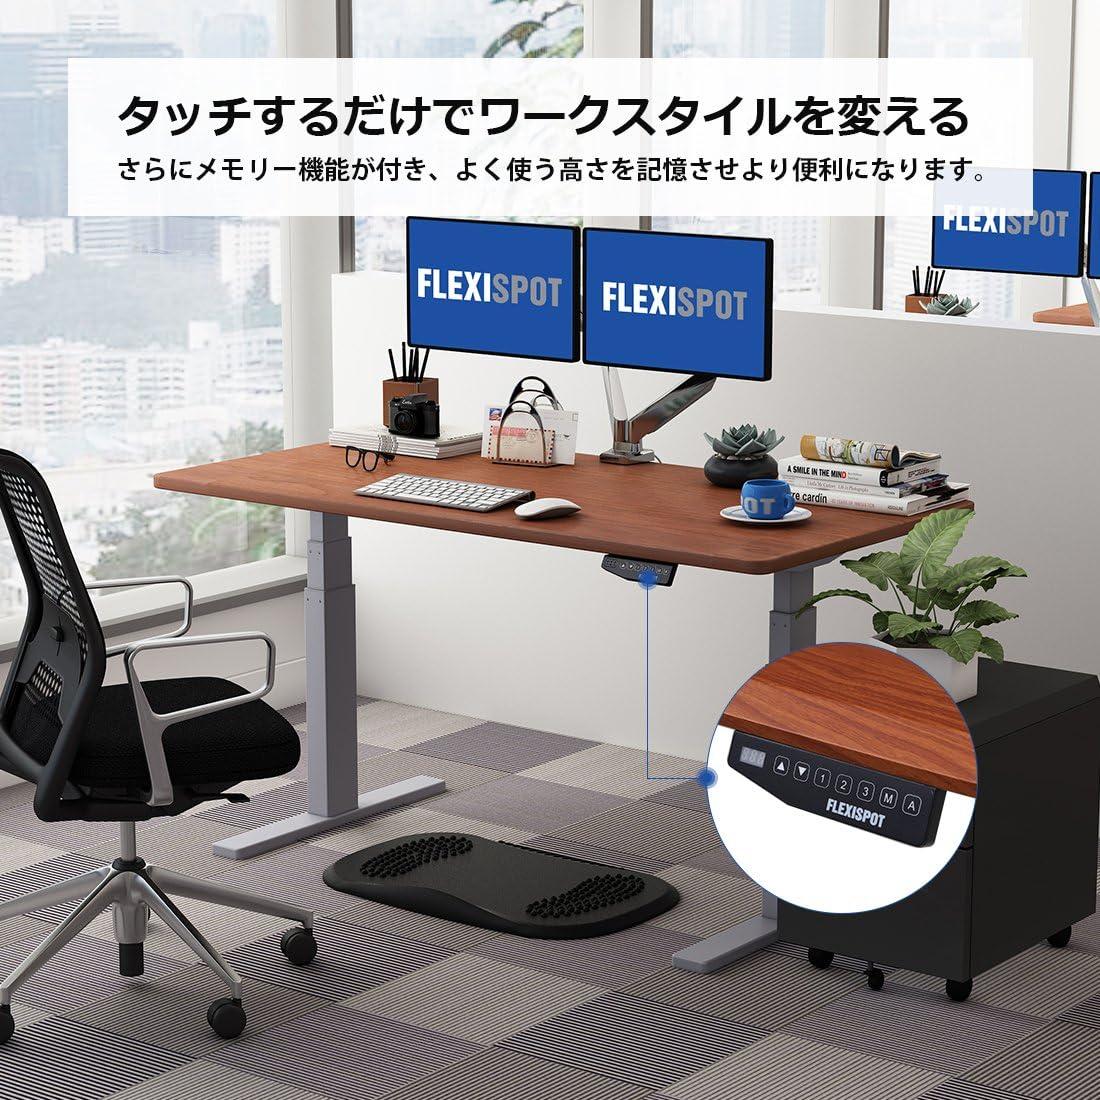 FLEXISPOT,スタンディングデスク 電動式 ,白い机,立ち仕事,PC作業用デスク,昇降デスク